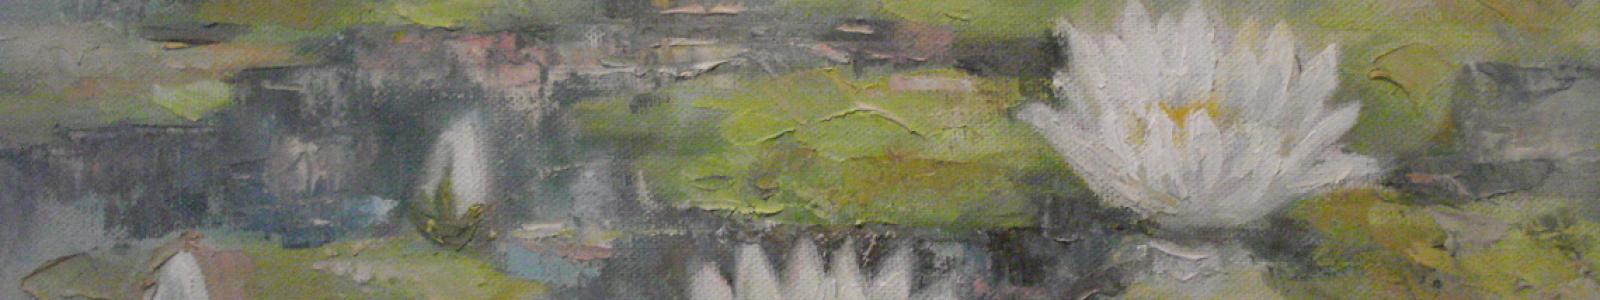 Gallery Painter Vladimir Nepomnyaschiy